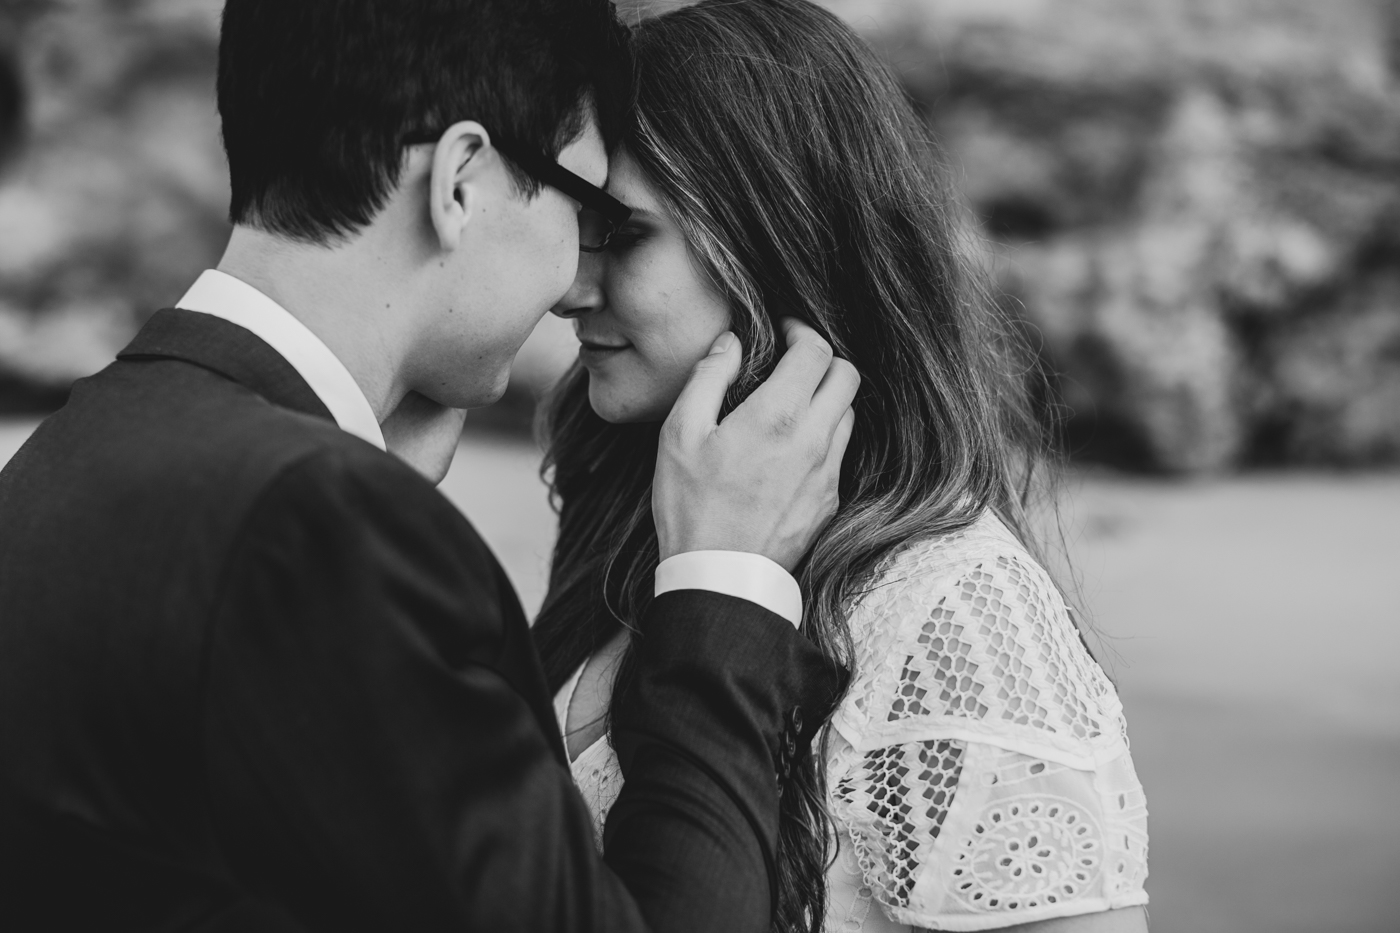 Ariana & Tim - Dunedin, New Zealand Wedding - Destination Wedding - Samantha Heather Photography-162.jpg